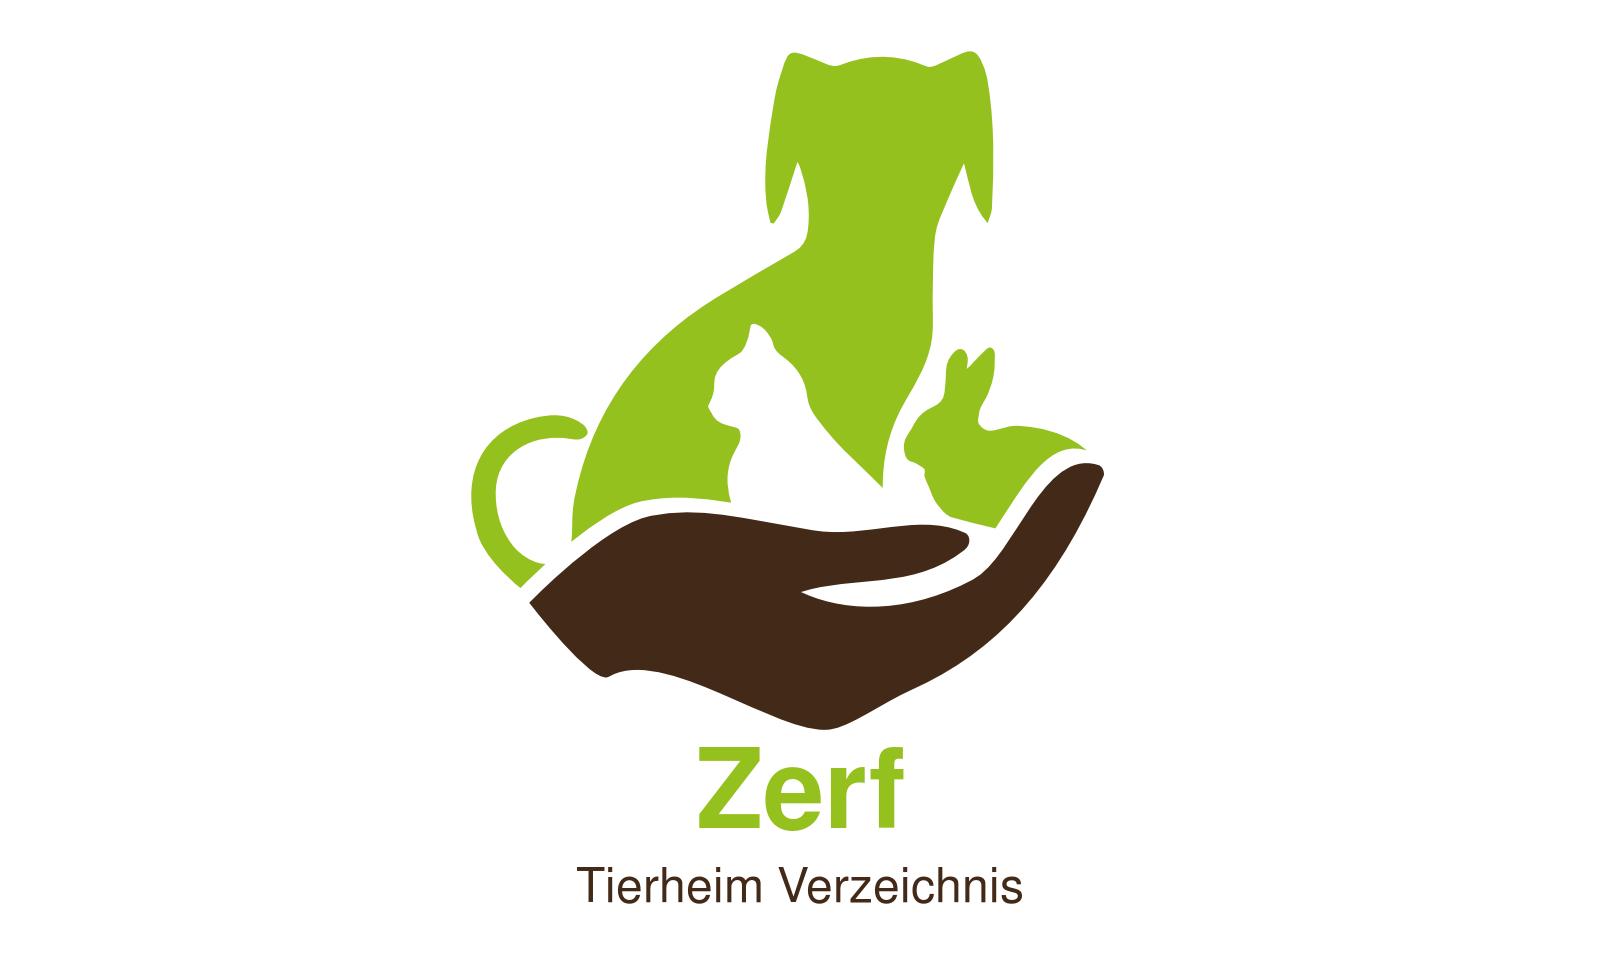 Tierheim Zerf